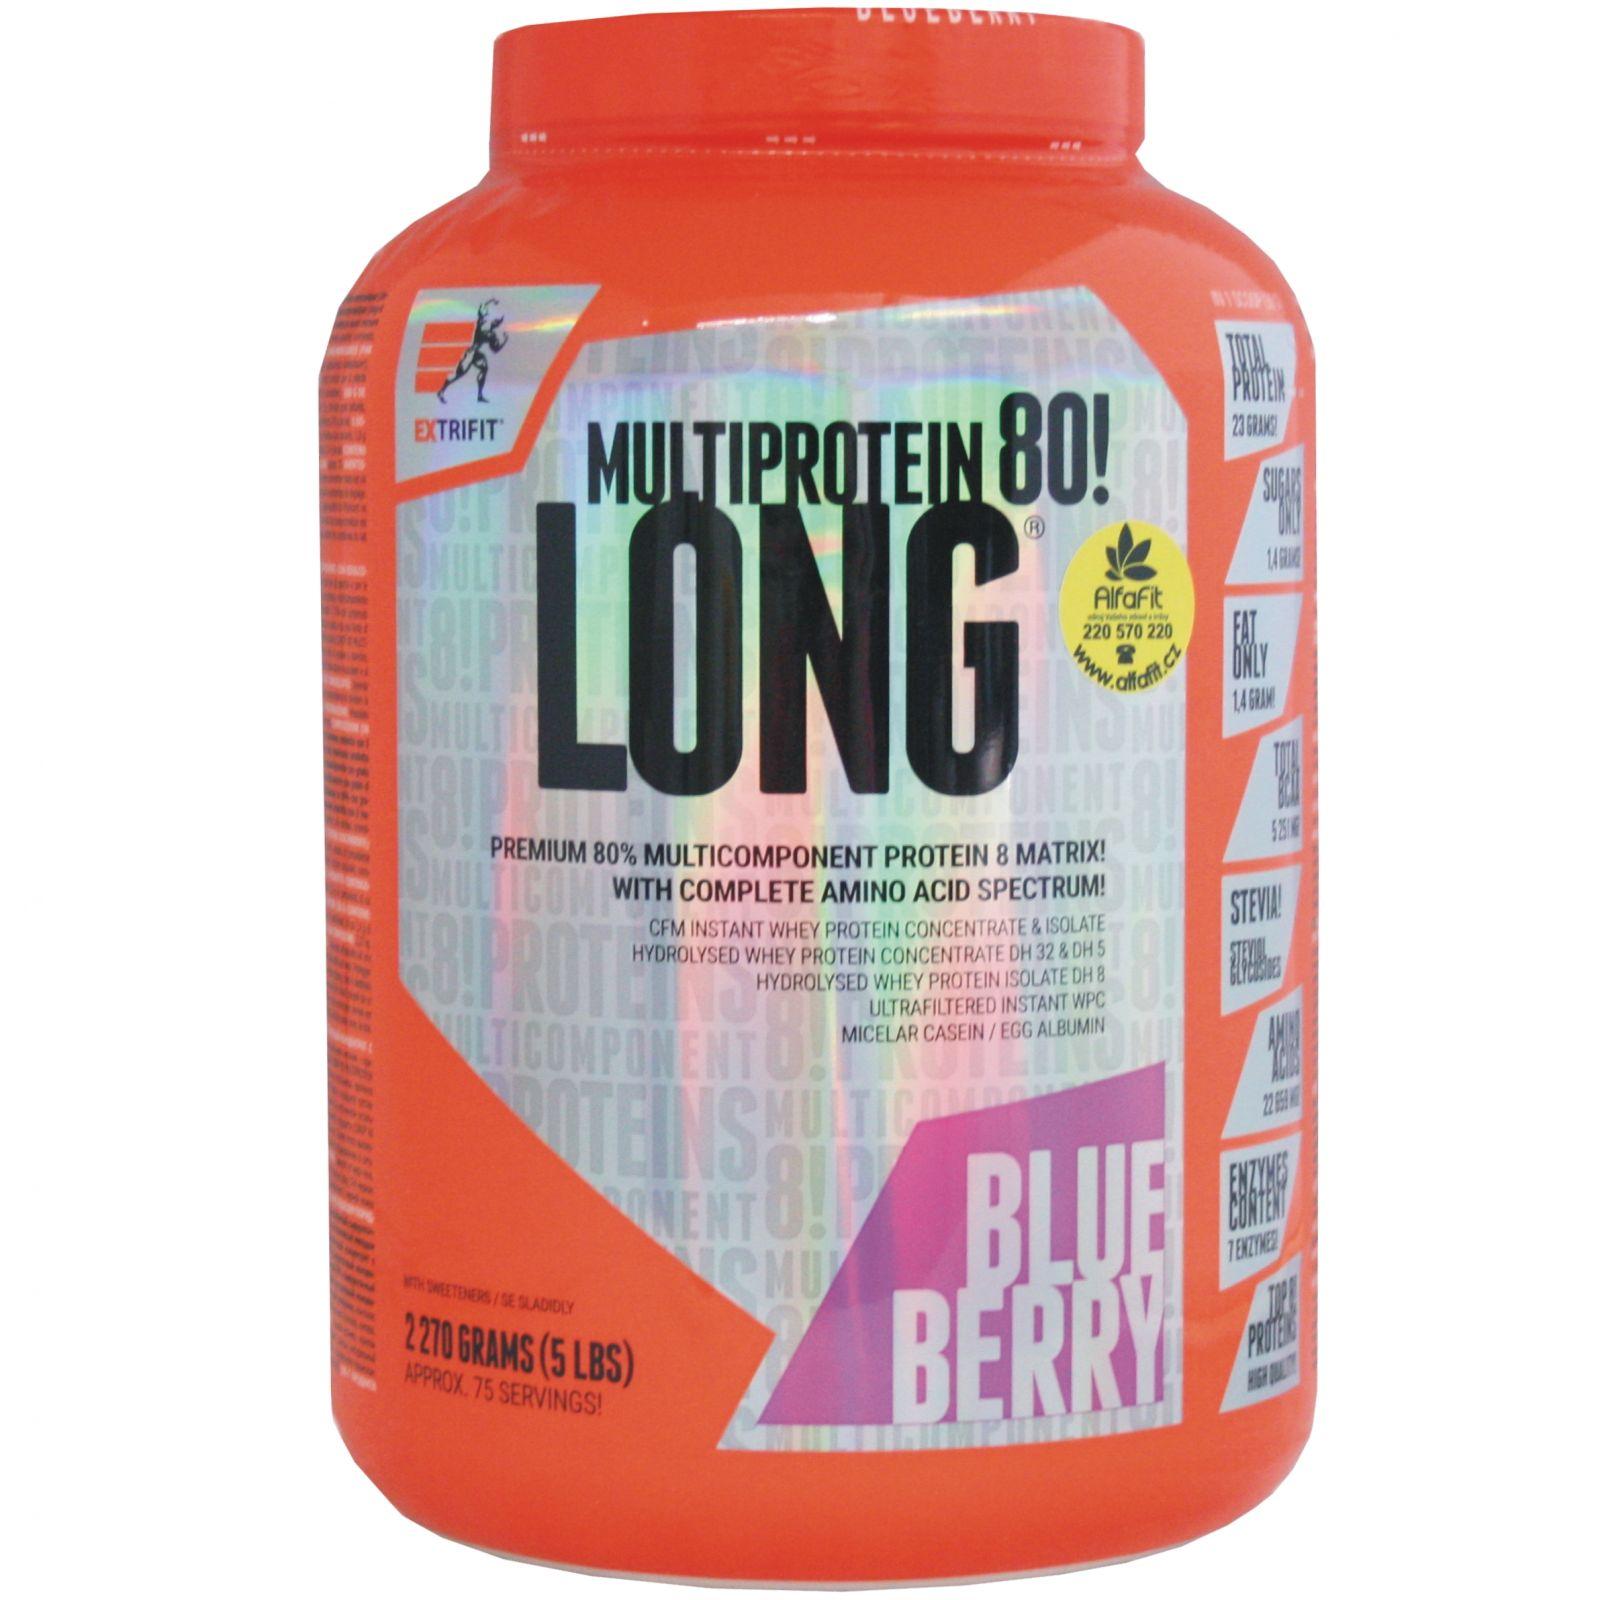 Extrifit Long 80 ─ 2270 g